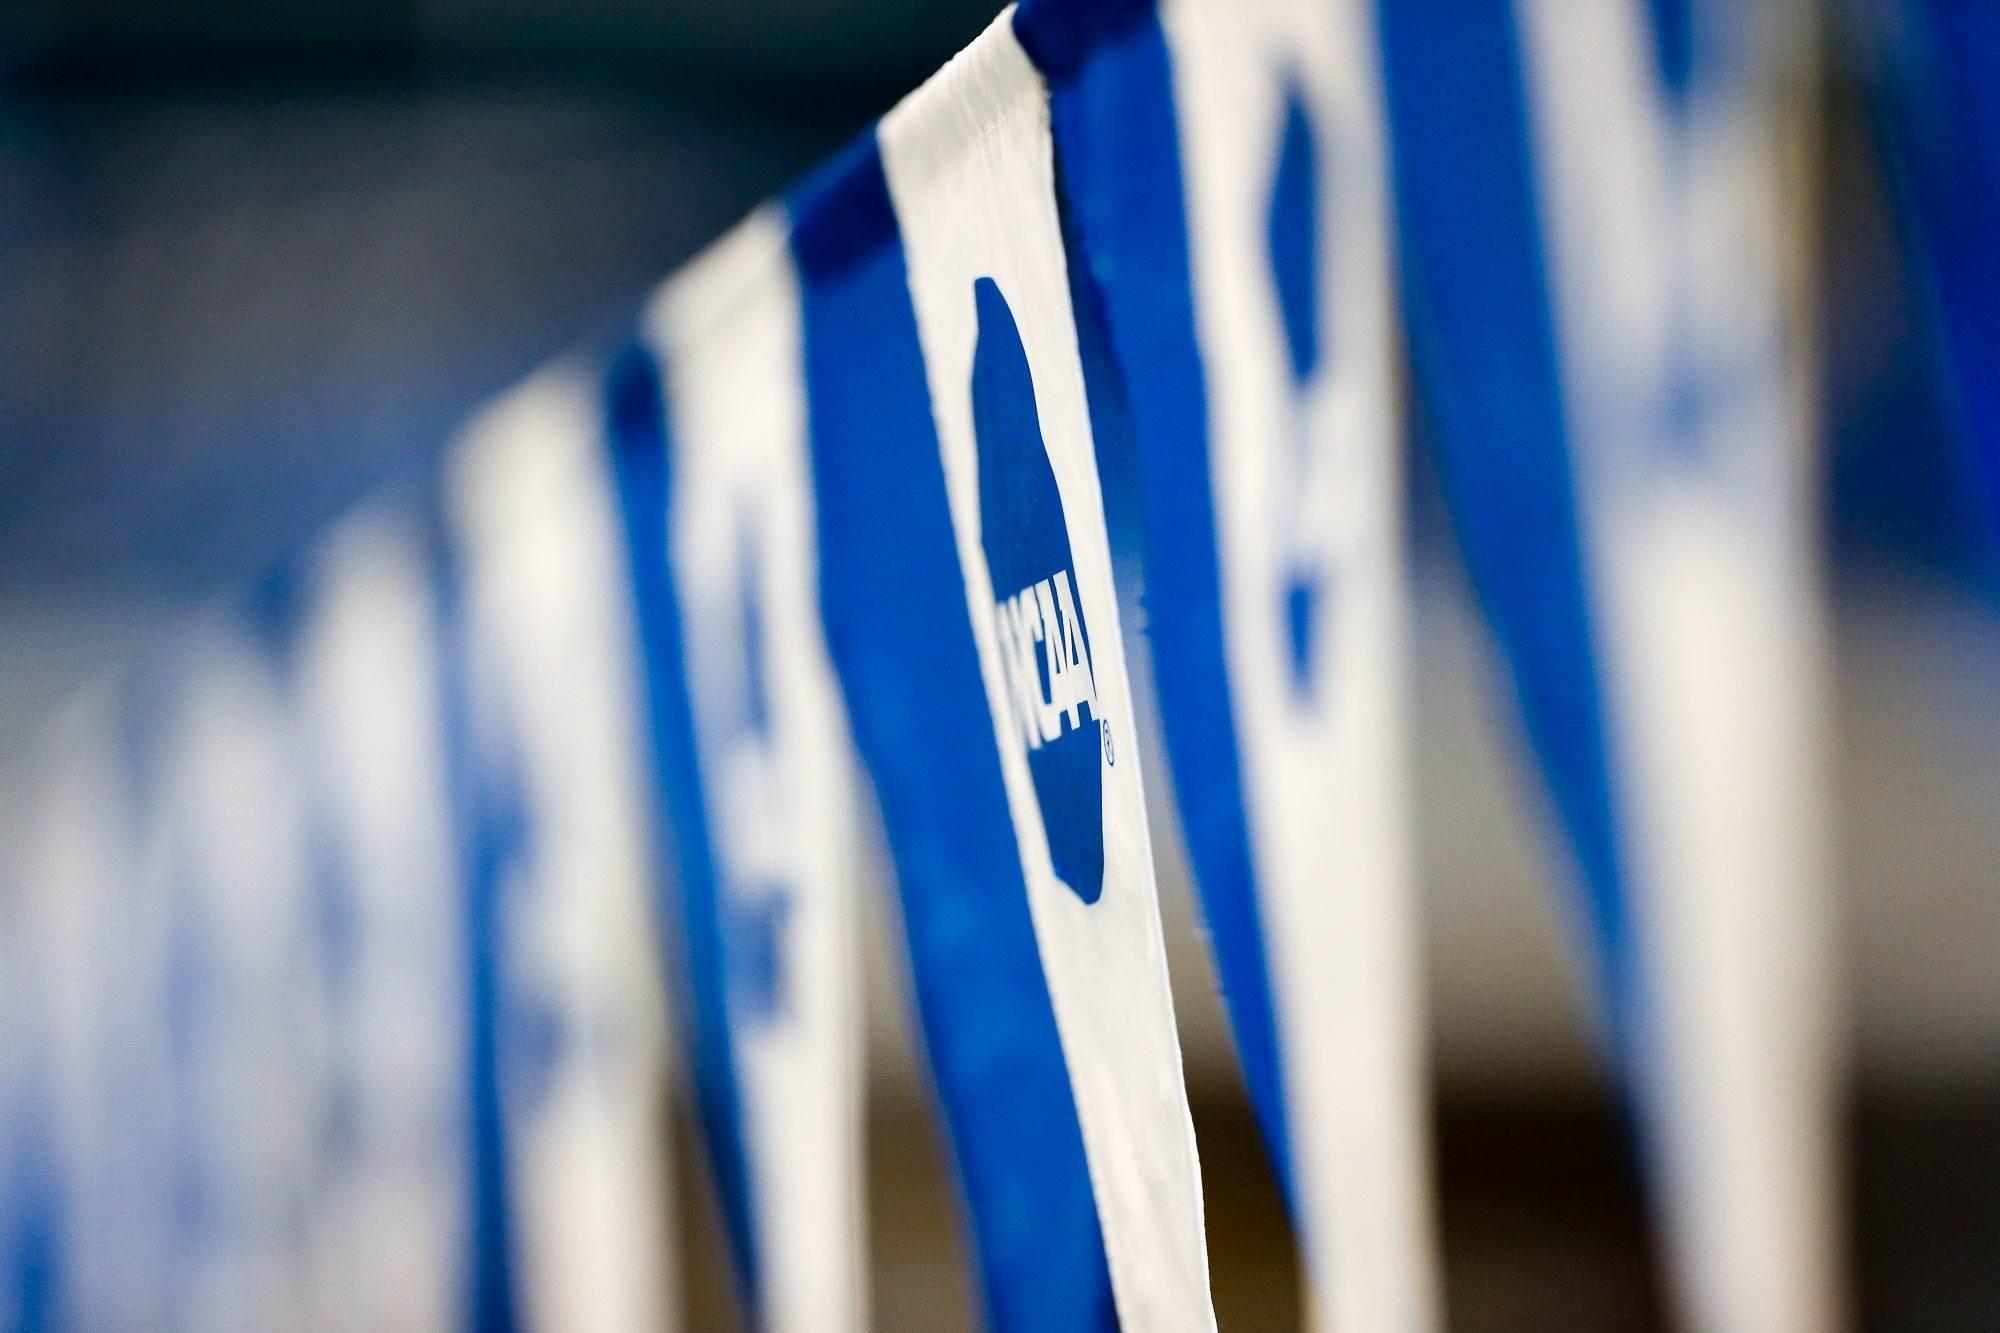 Forbes Piece: Title IX Isn't Causing Men's NCAA Program Cuts